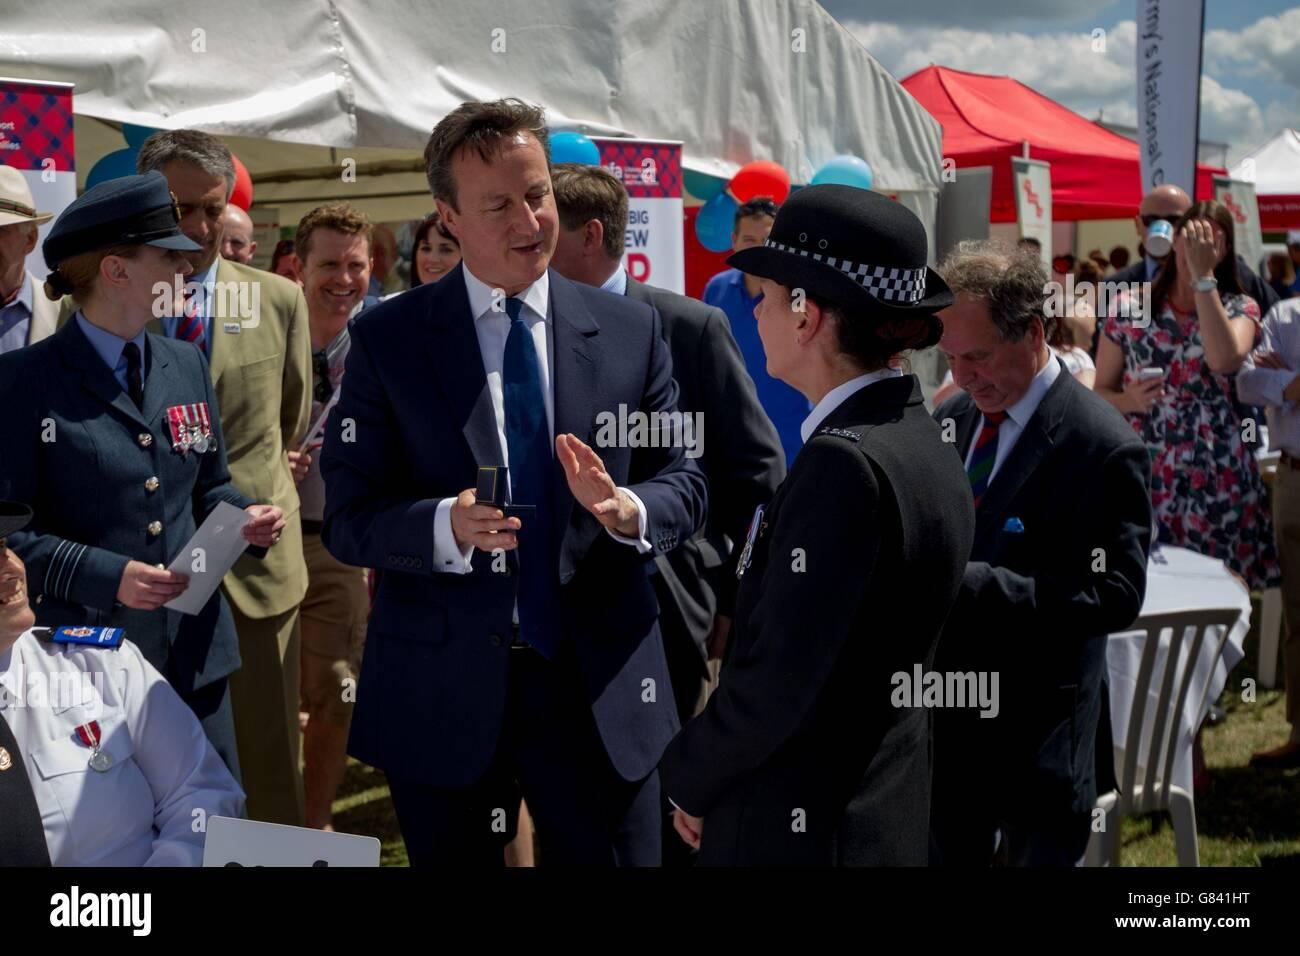 Premierminister David Cameron betrachtet Exponate im Stoke Park am Tag der Streitkräfte in Guildford. Stockfoto